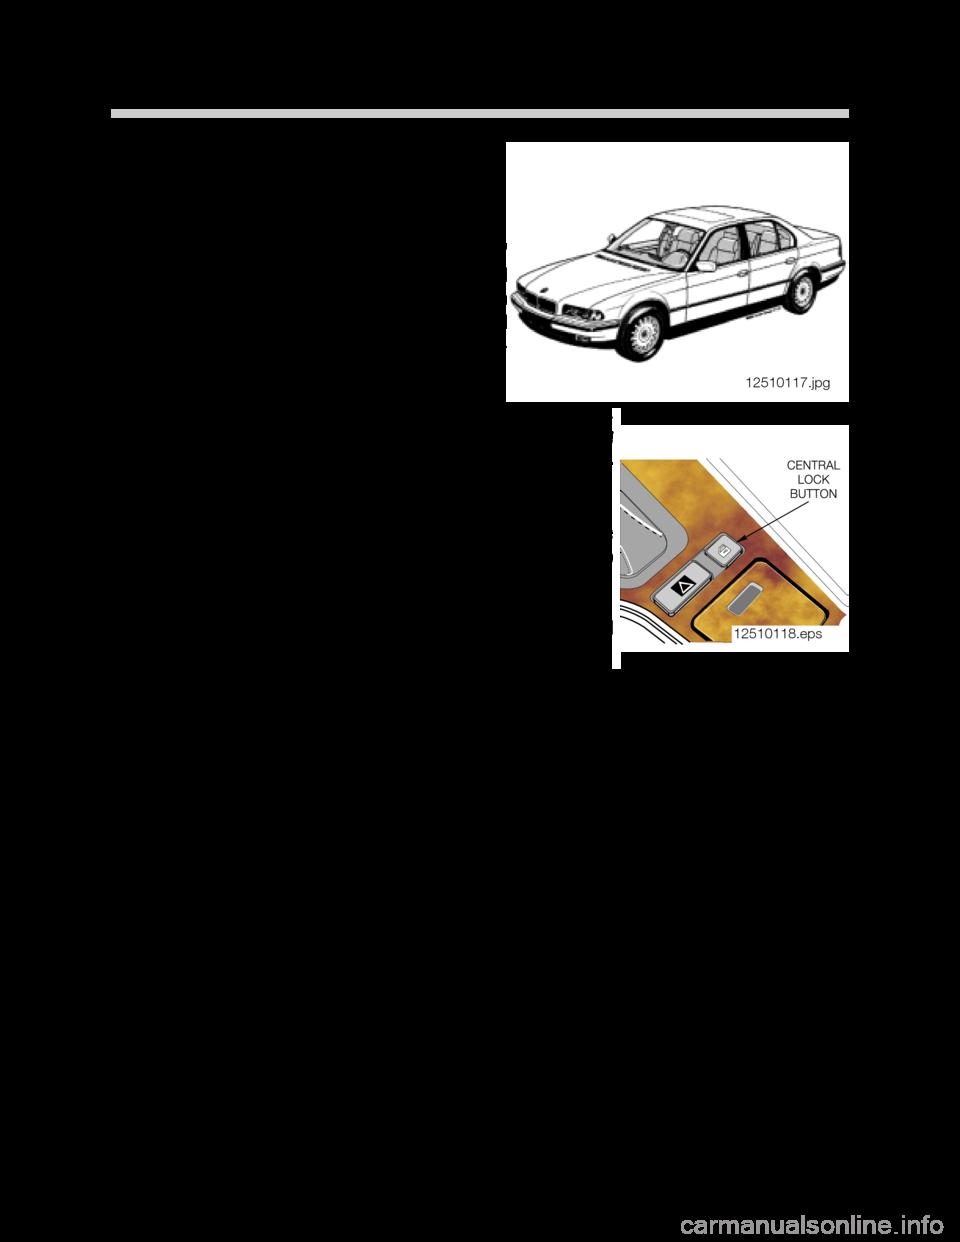 Bmw 530i 1998 E39 Central Body Electronics Zke Manual Engine Module Wiring Diagram